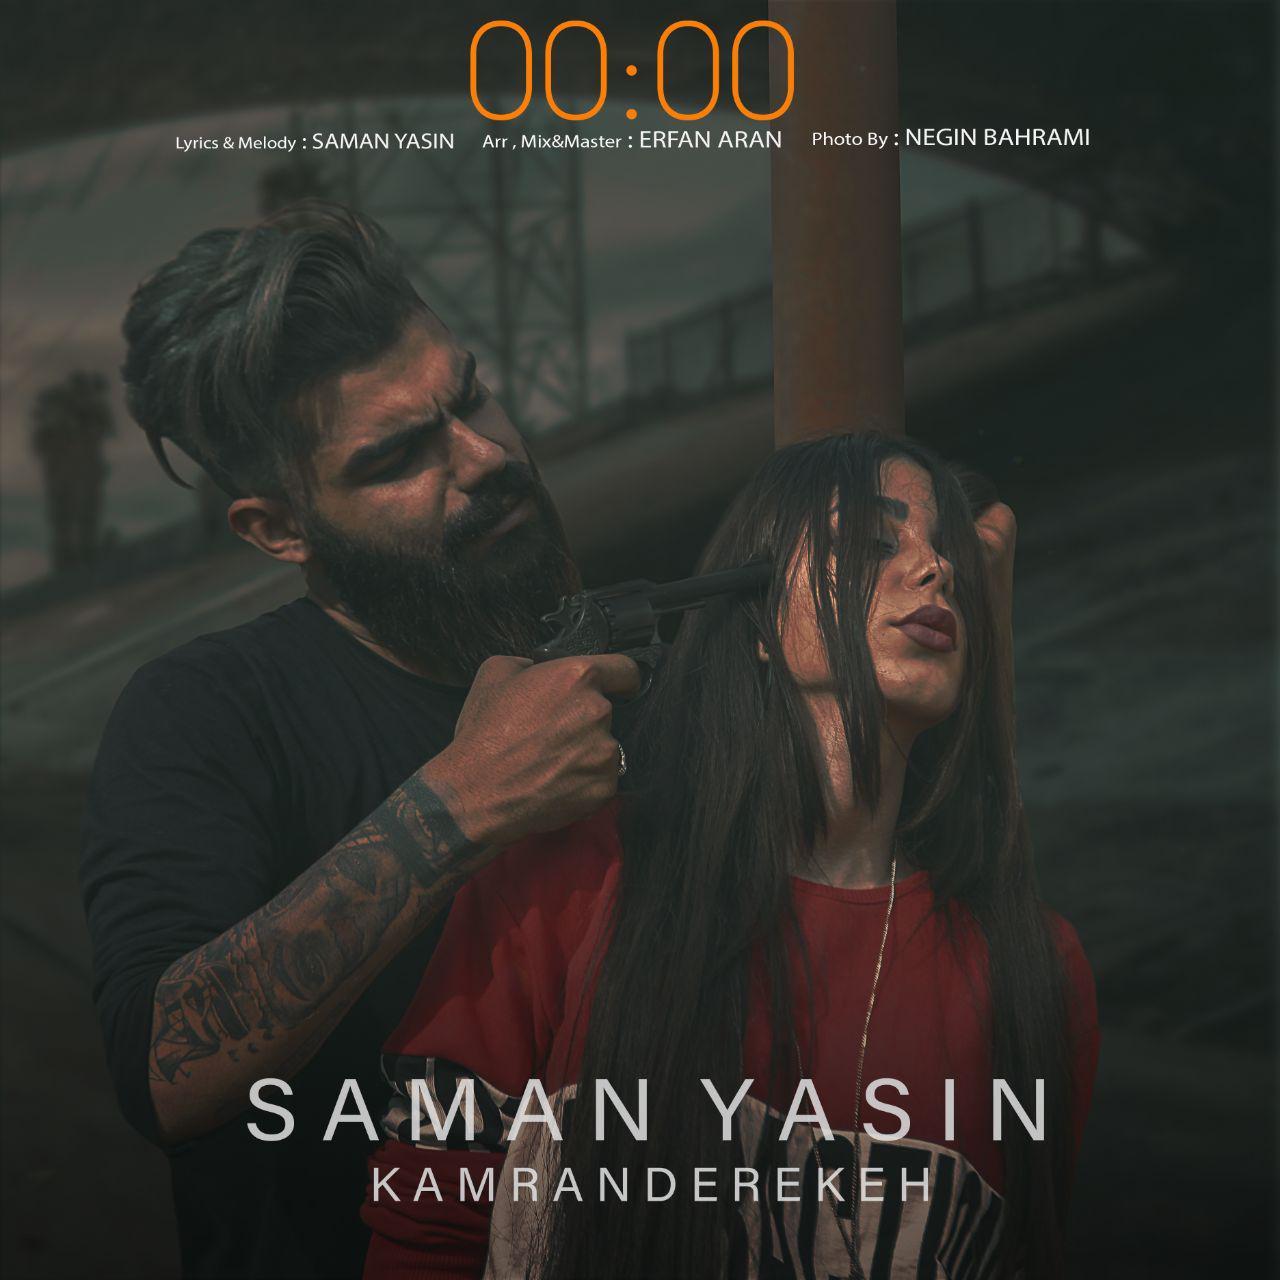 photo 2019 06 02 10 22 09 - دانلود آهنگ جدید سامان یاسین بنام 12 شب